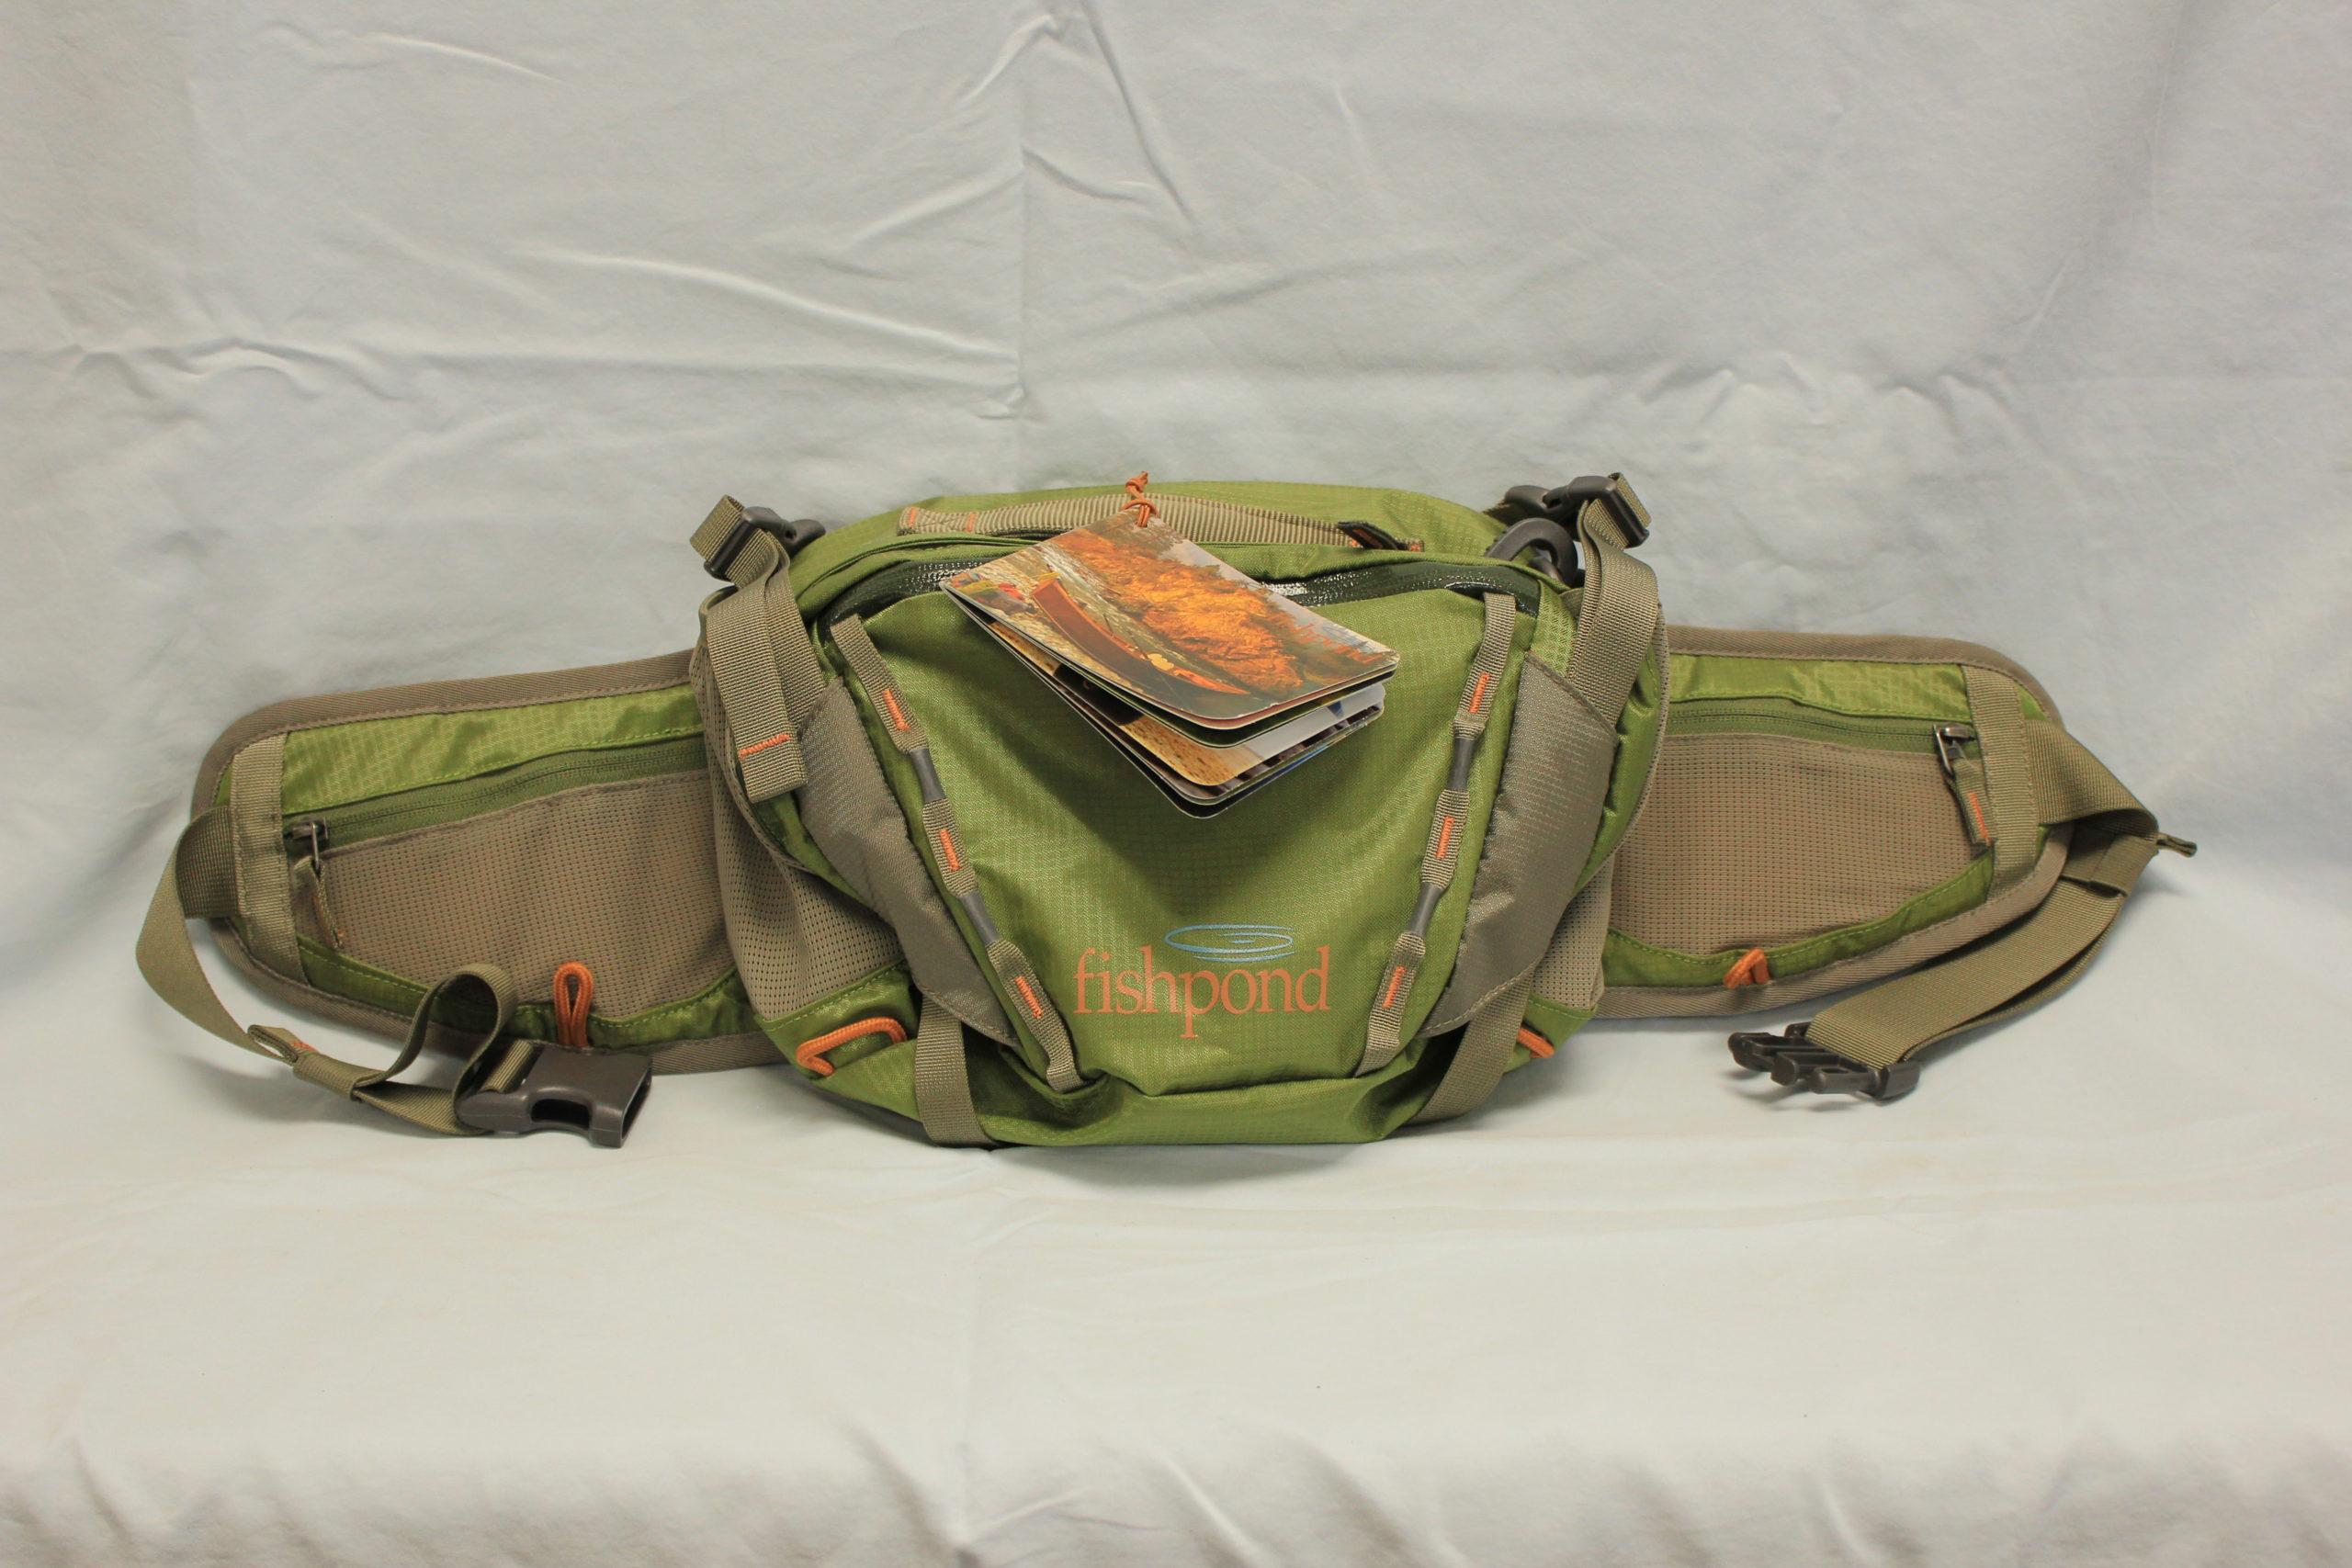 encampment pack